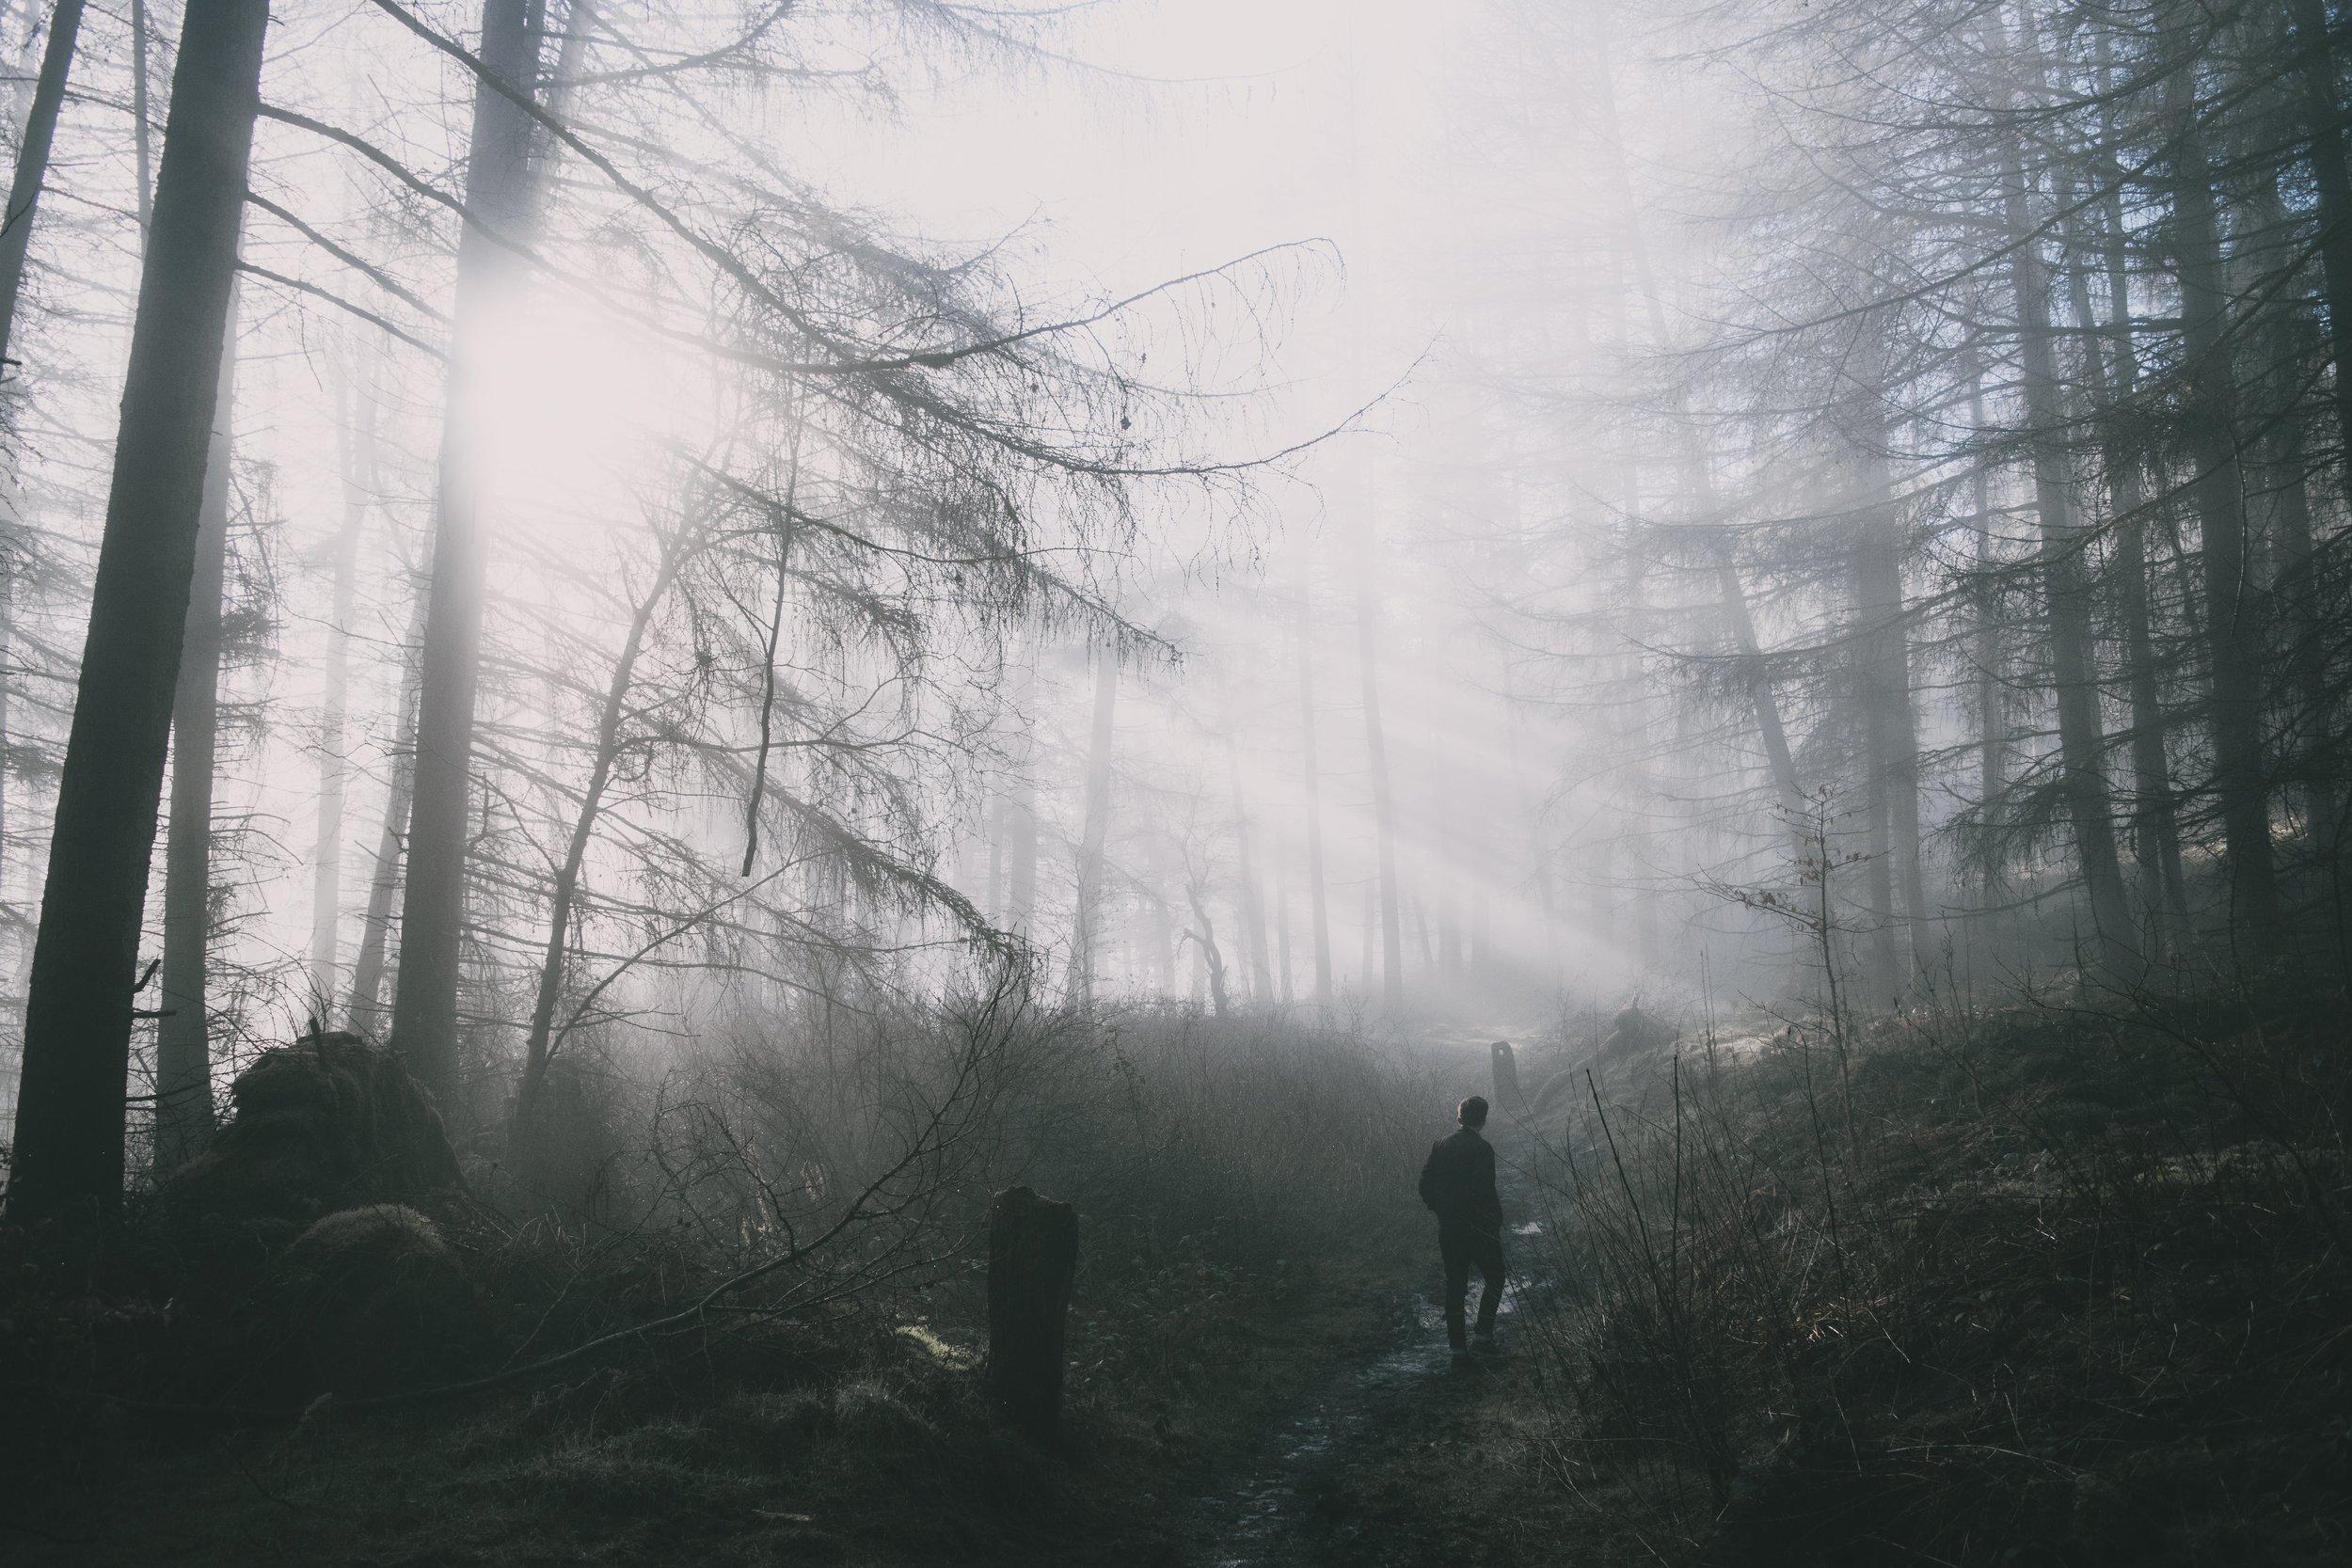 Harry Renton Hippo Magazine Sun Shining through foggy forest